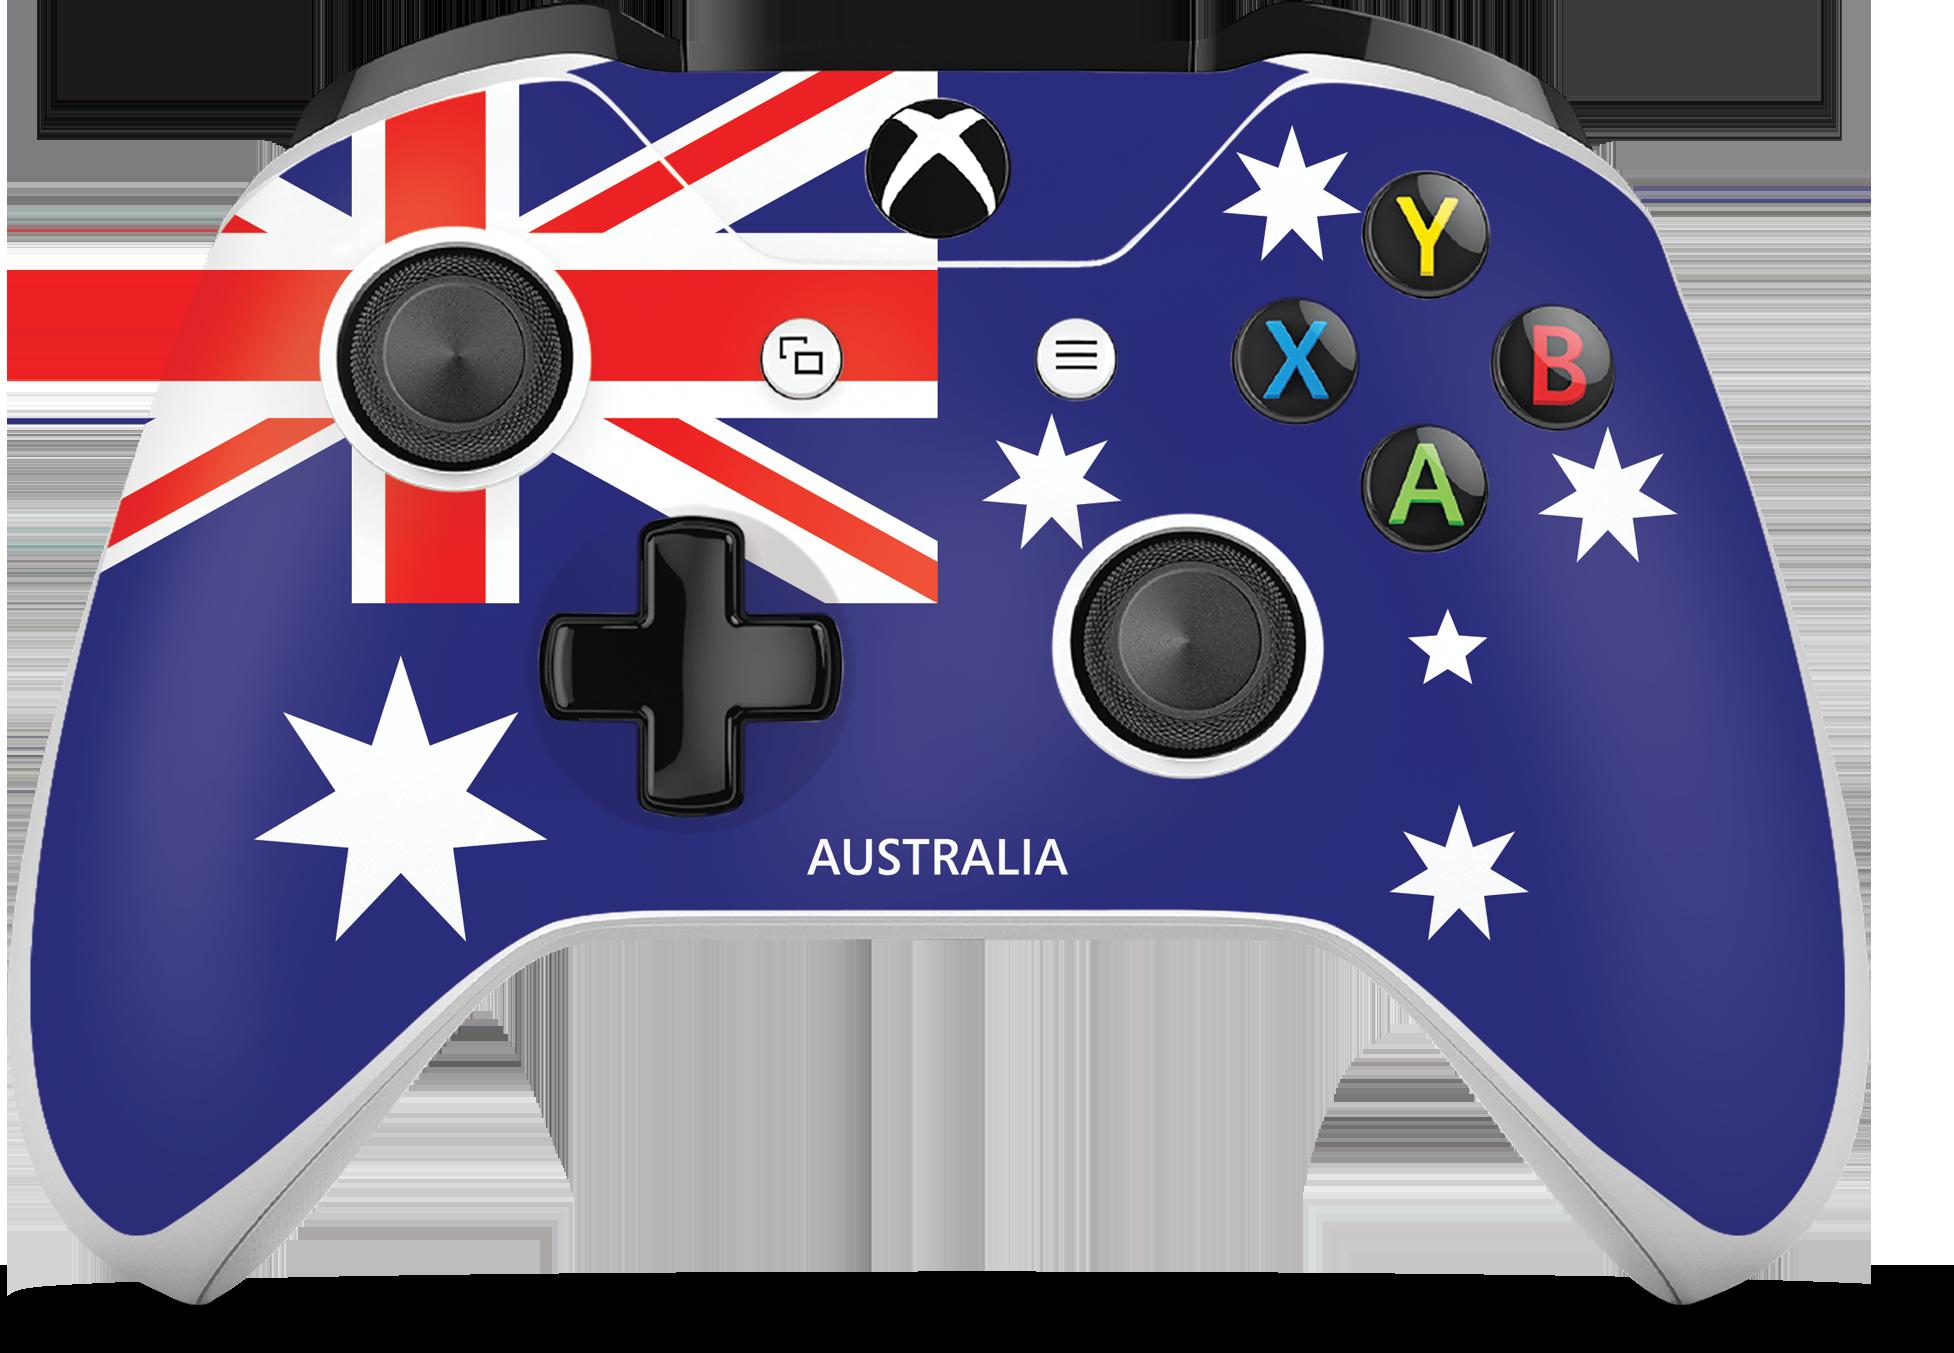 RE1ZiFJ?ver=38d4 - Controller Gear World's Game Controller Skins (Australia)